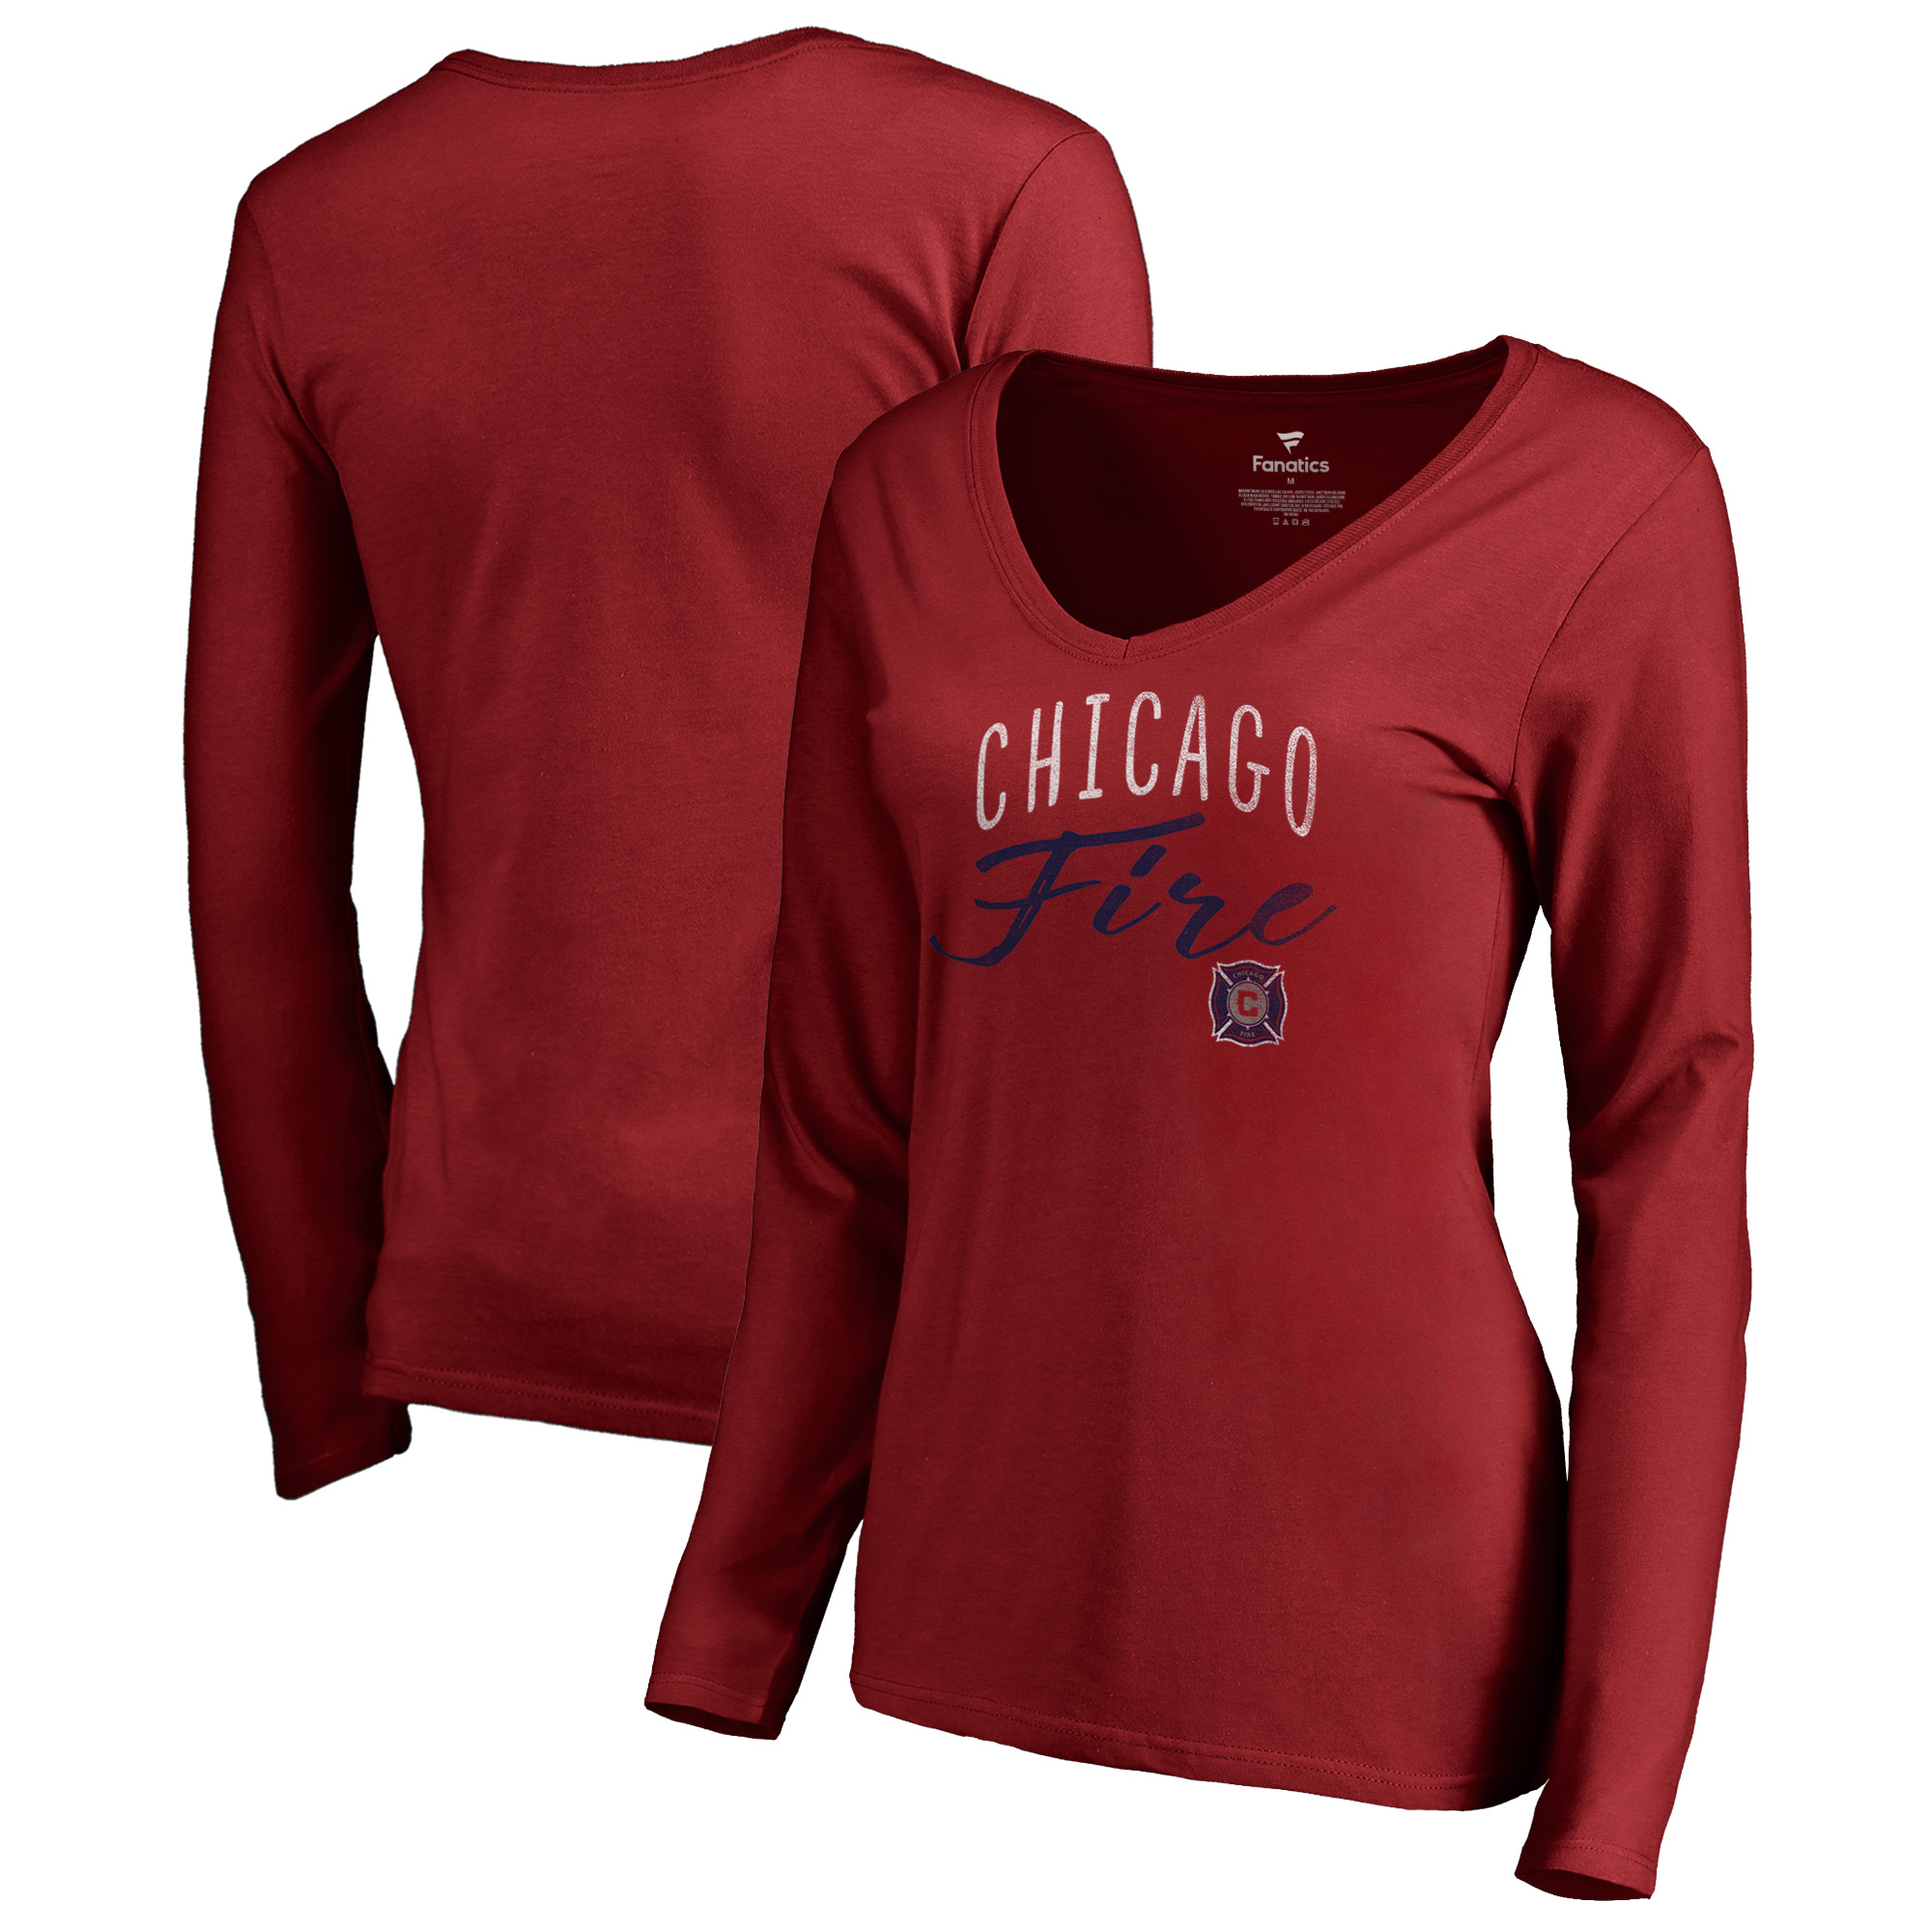 Chicago Fire Fanatics Branded Women's Graceful V-Neck Long Sleeve T-Shirt - Red